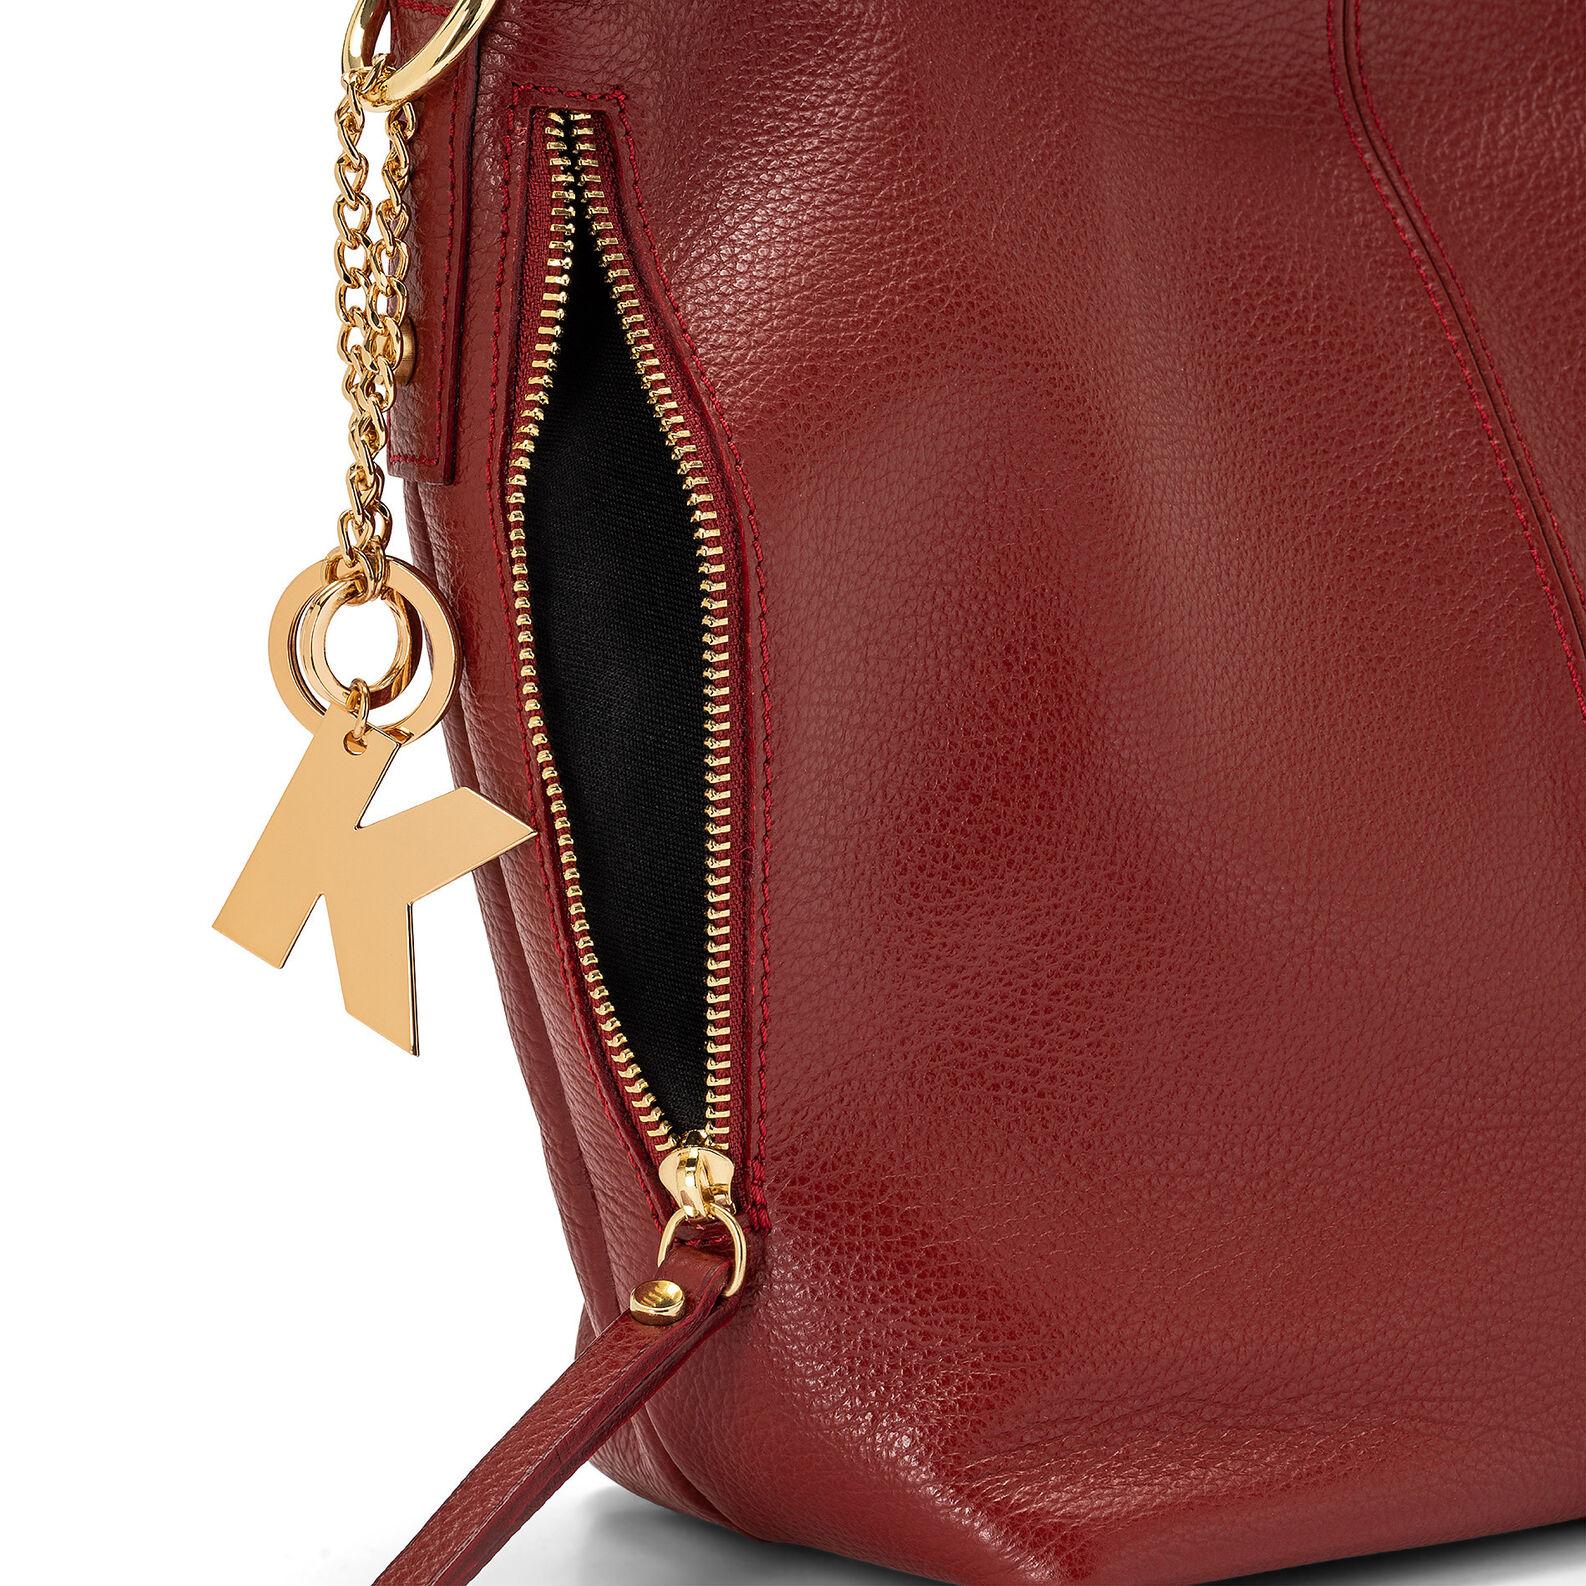 Koan genuine leather bag